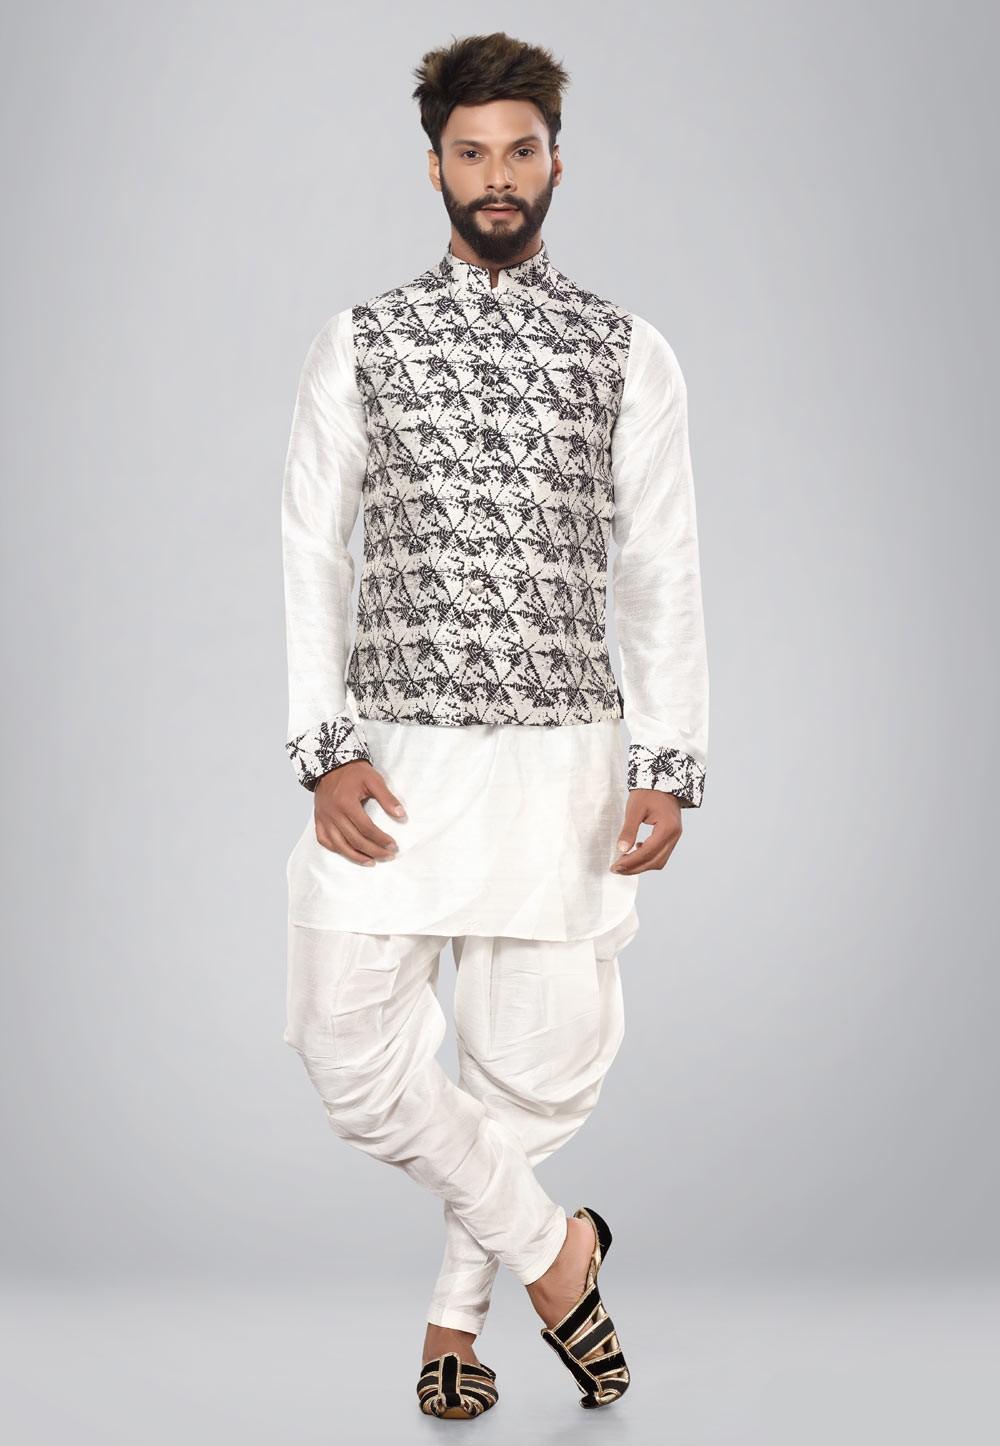 Buy white,black color latest kurta pajama with nehru jacket